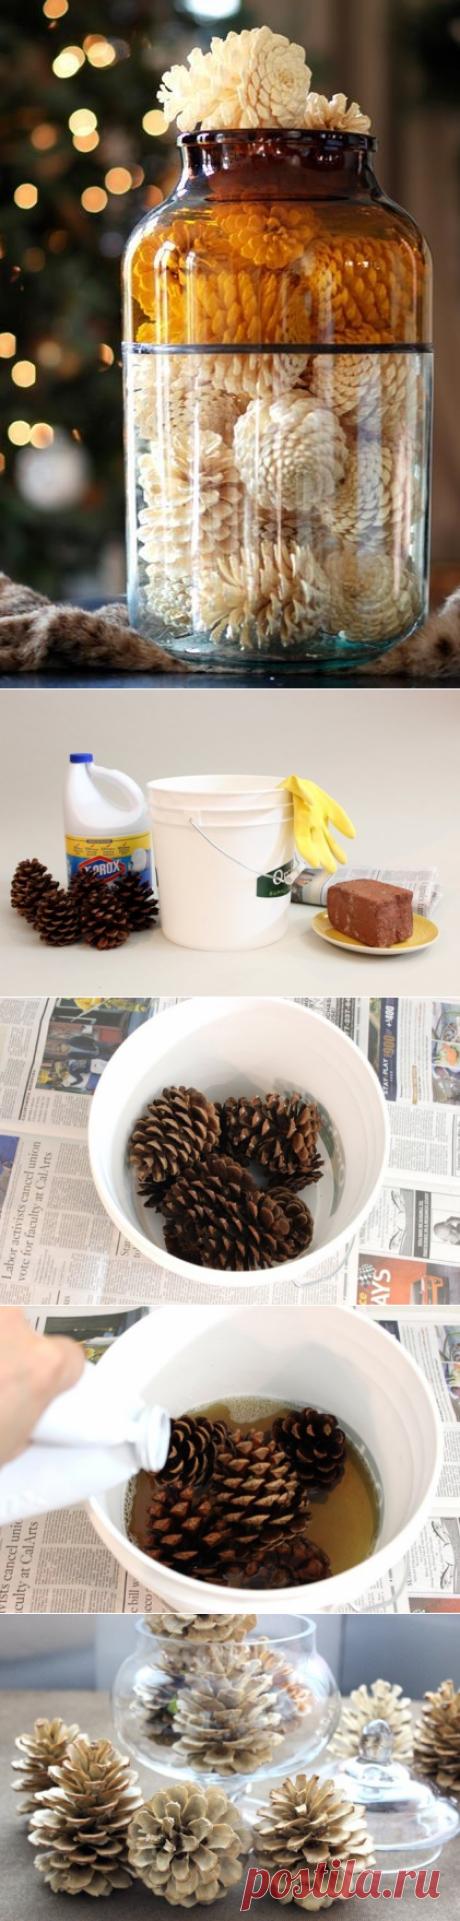 We bleach pine cones